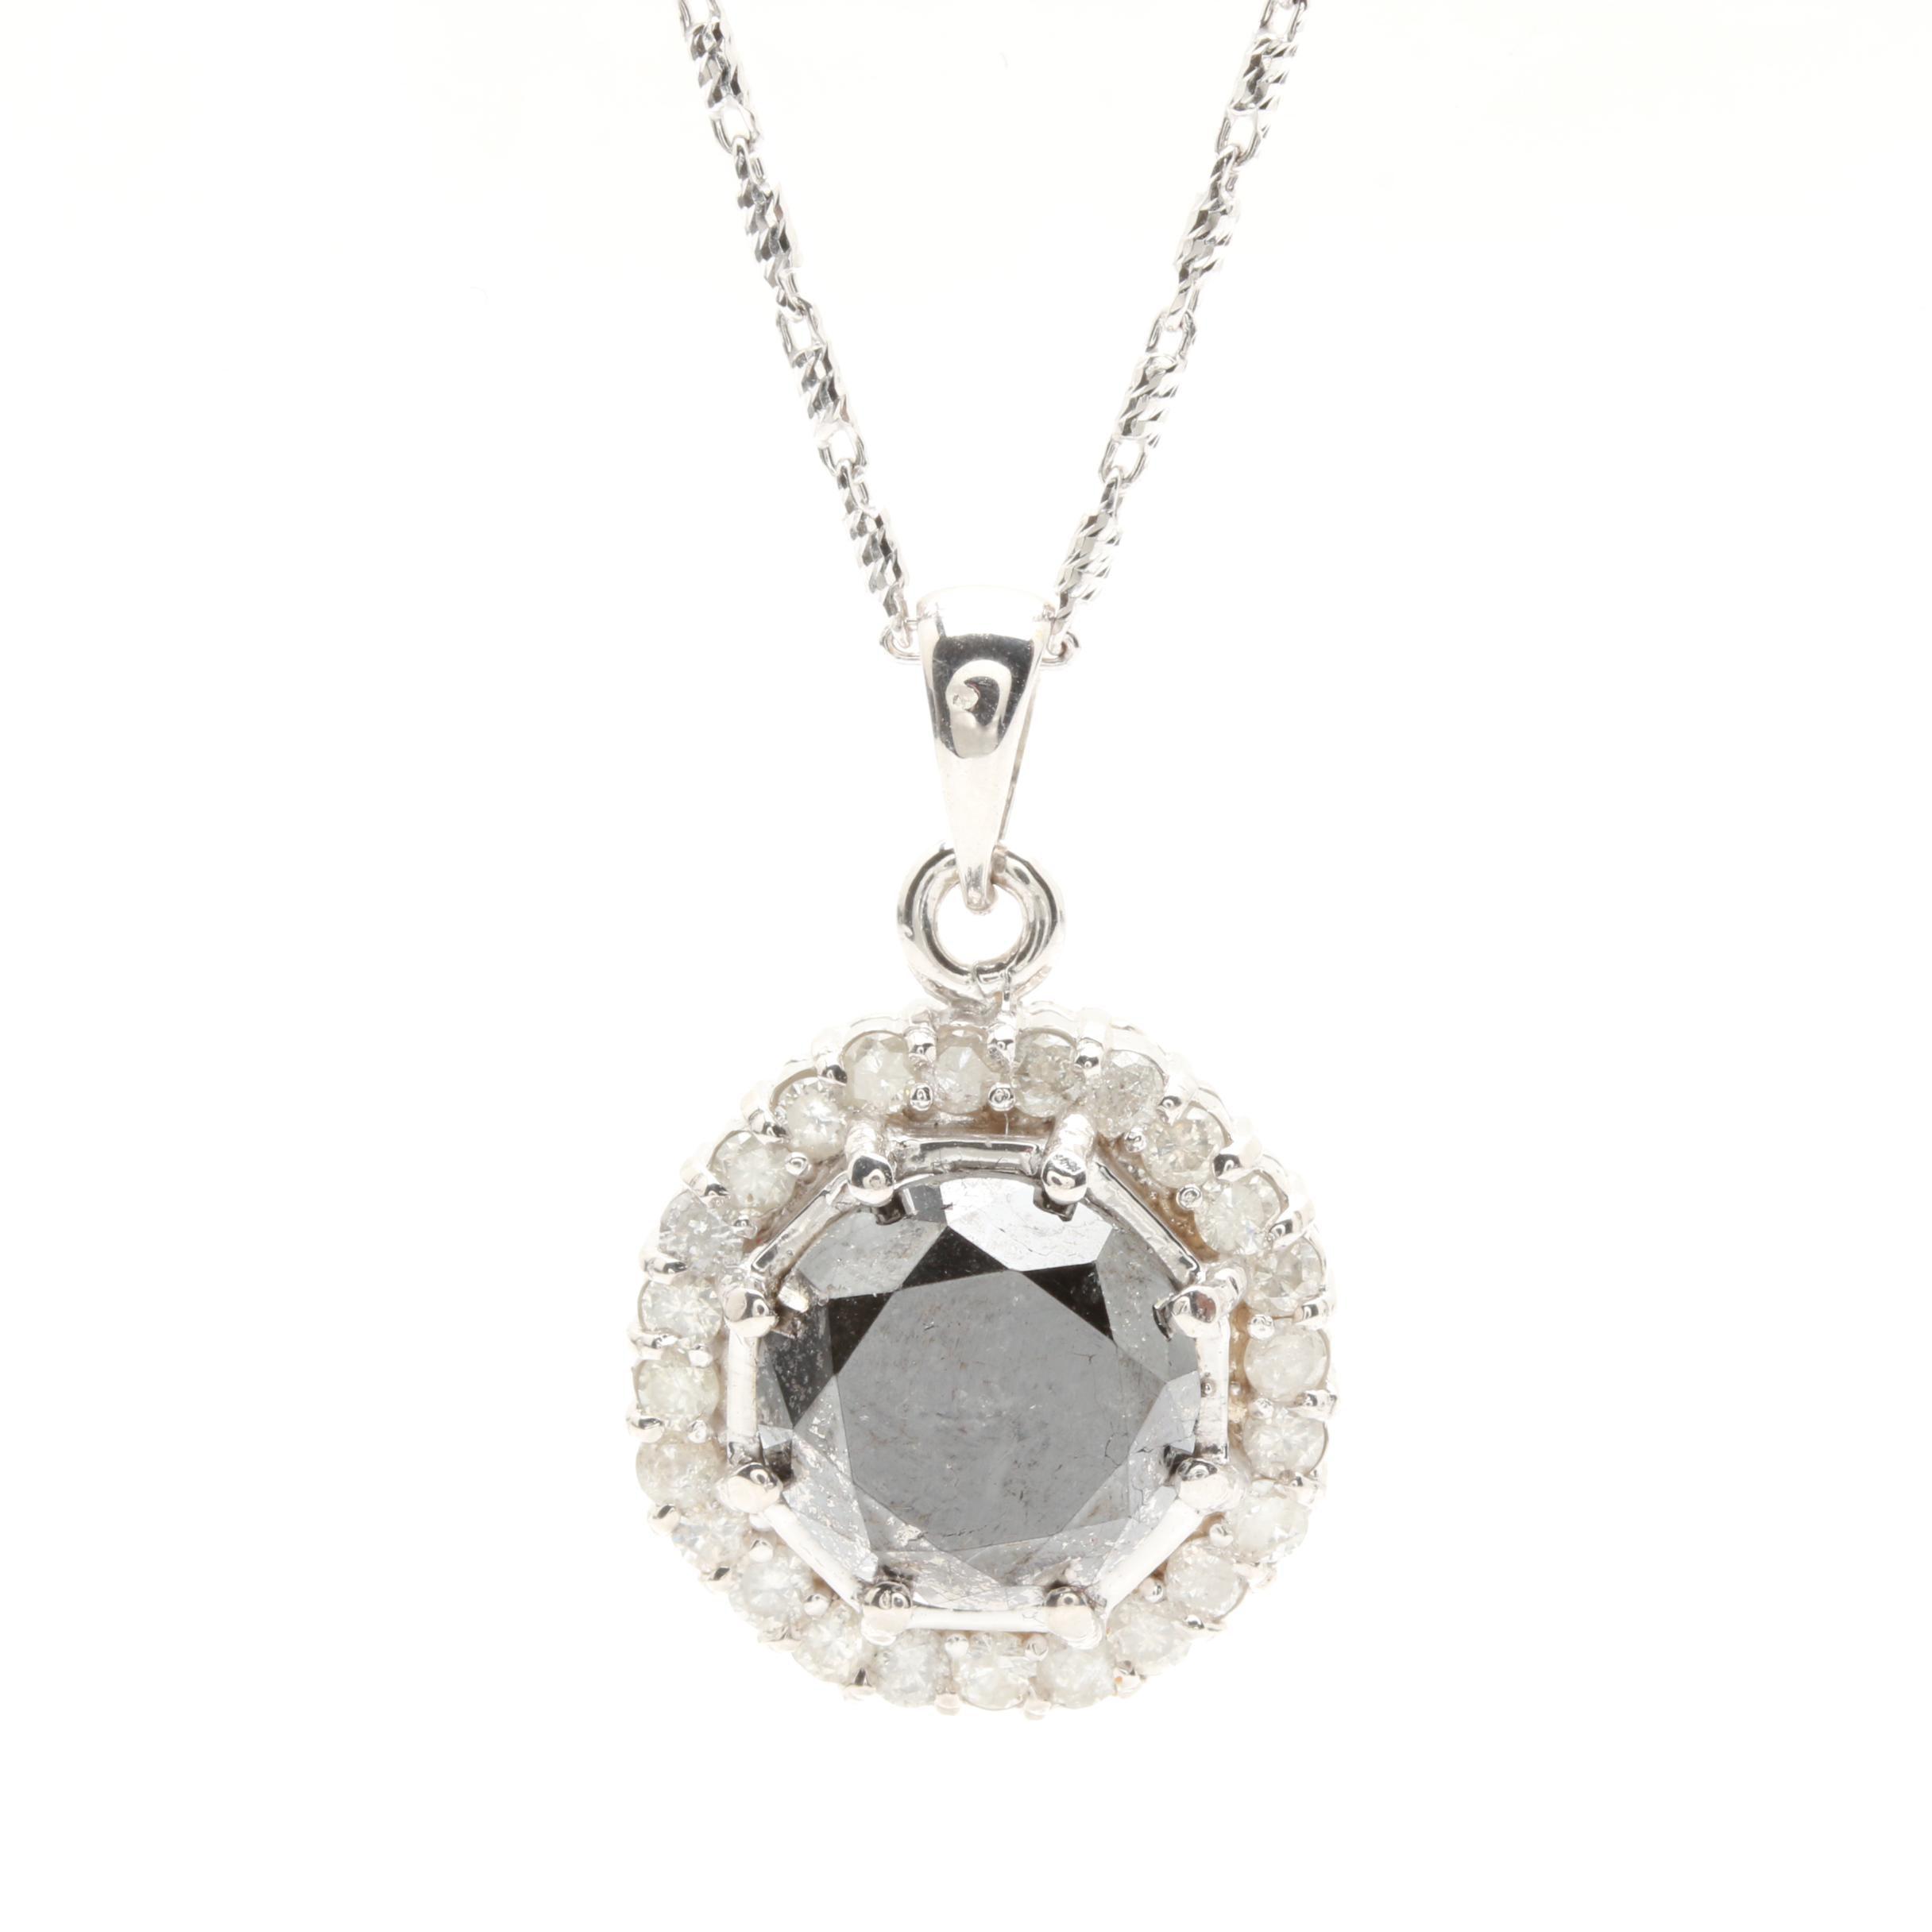 14K White Gold 5.85 CTW Diamond Pendant Necklace